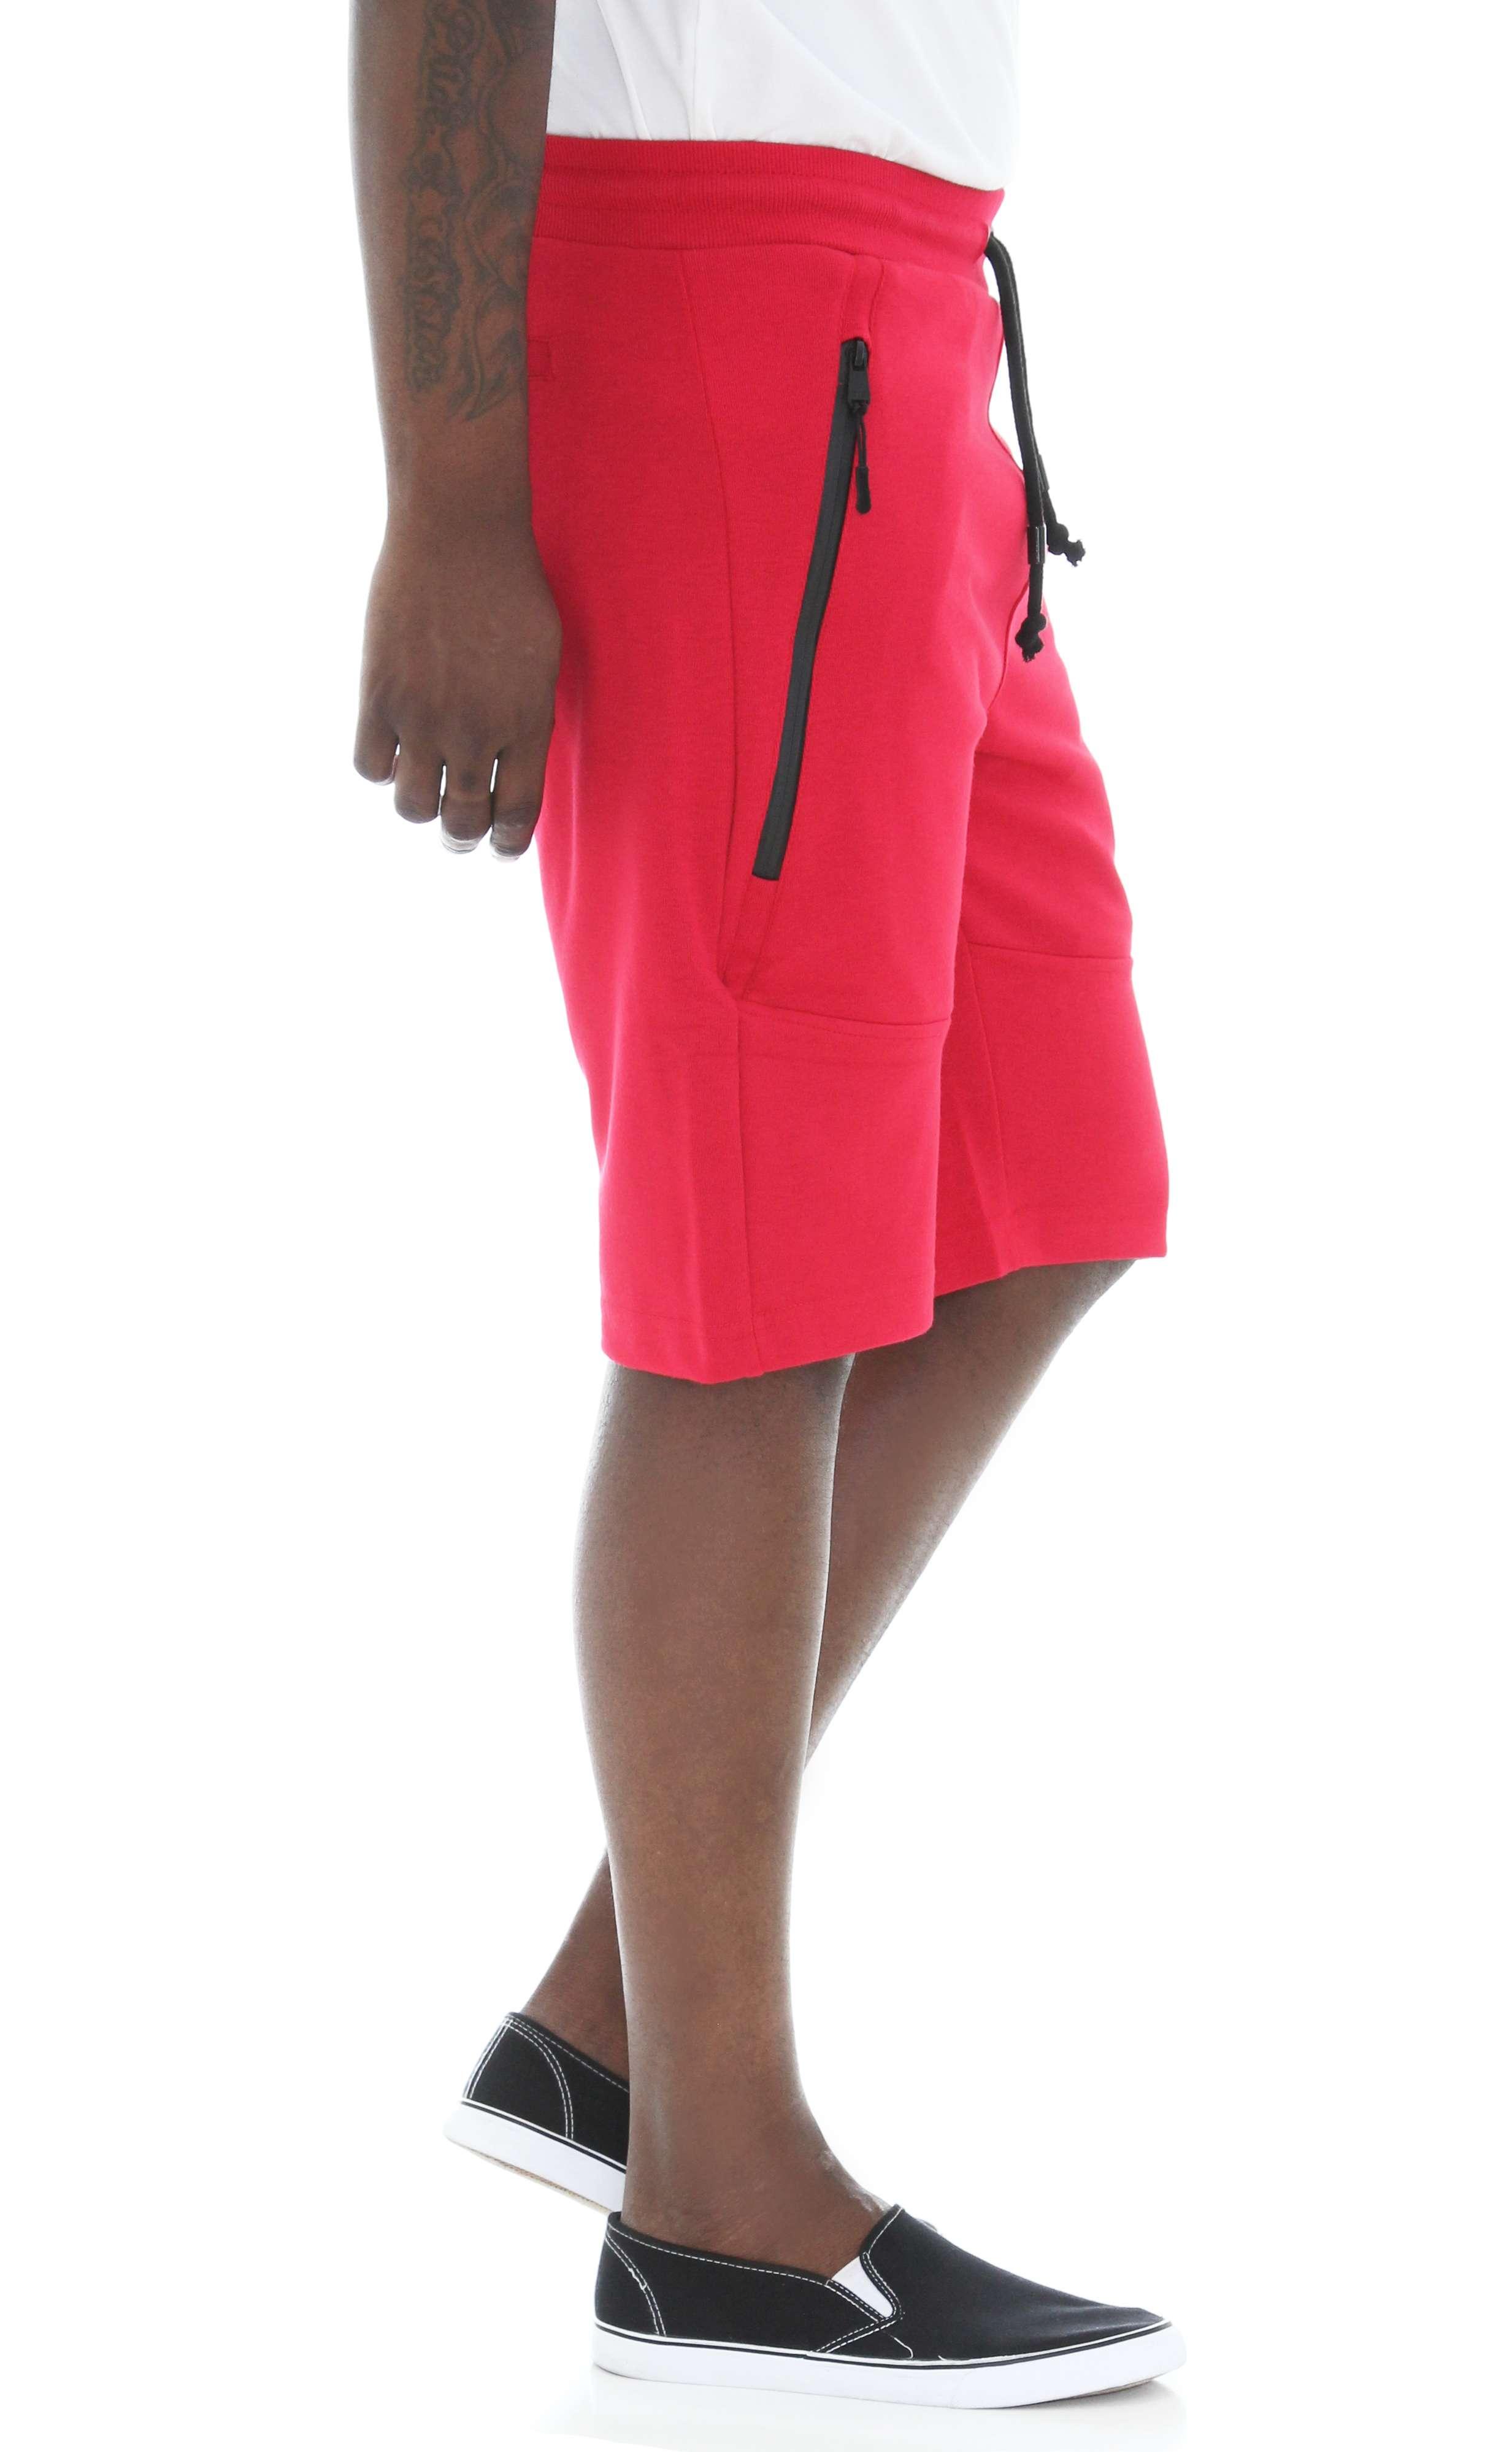 jordan shorts with zipper pockets